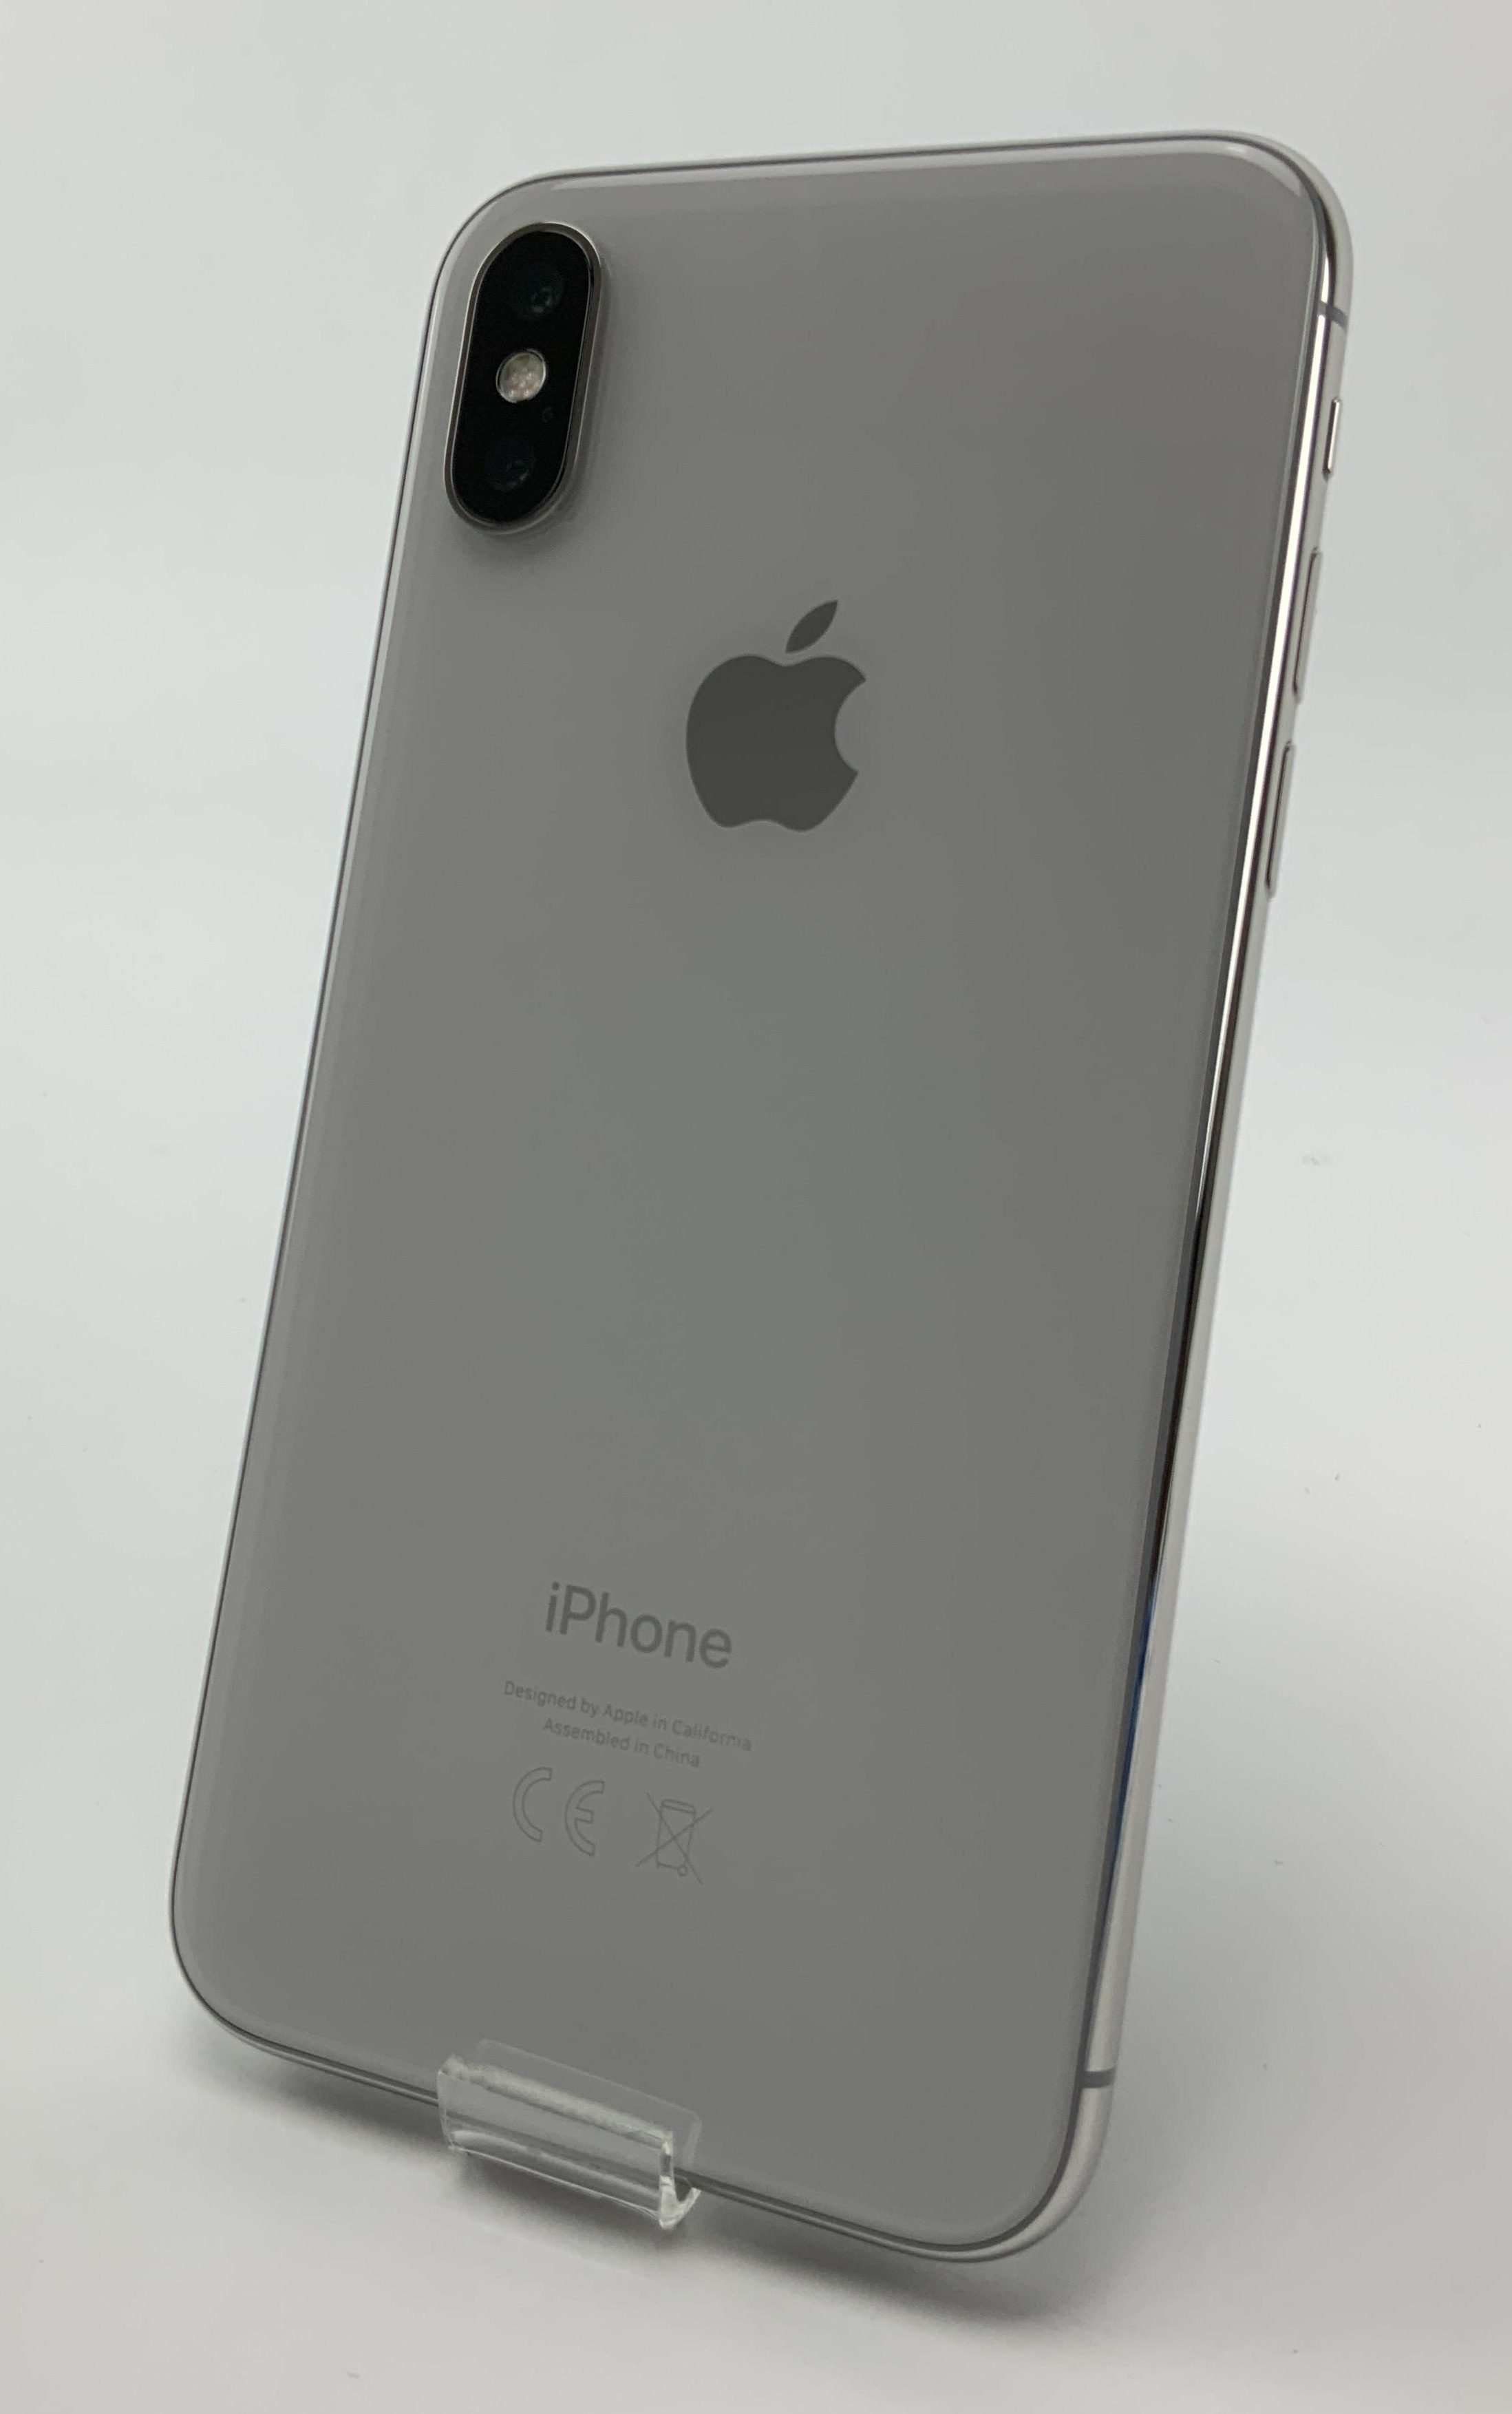 iPhone X 64GB, 64GB, Silver, obraz 2